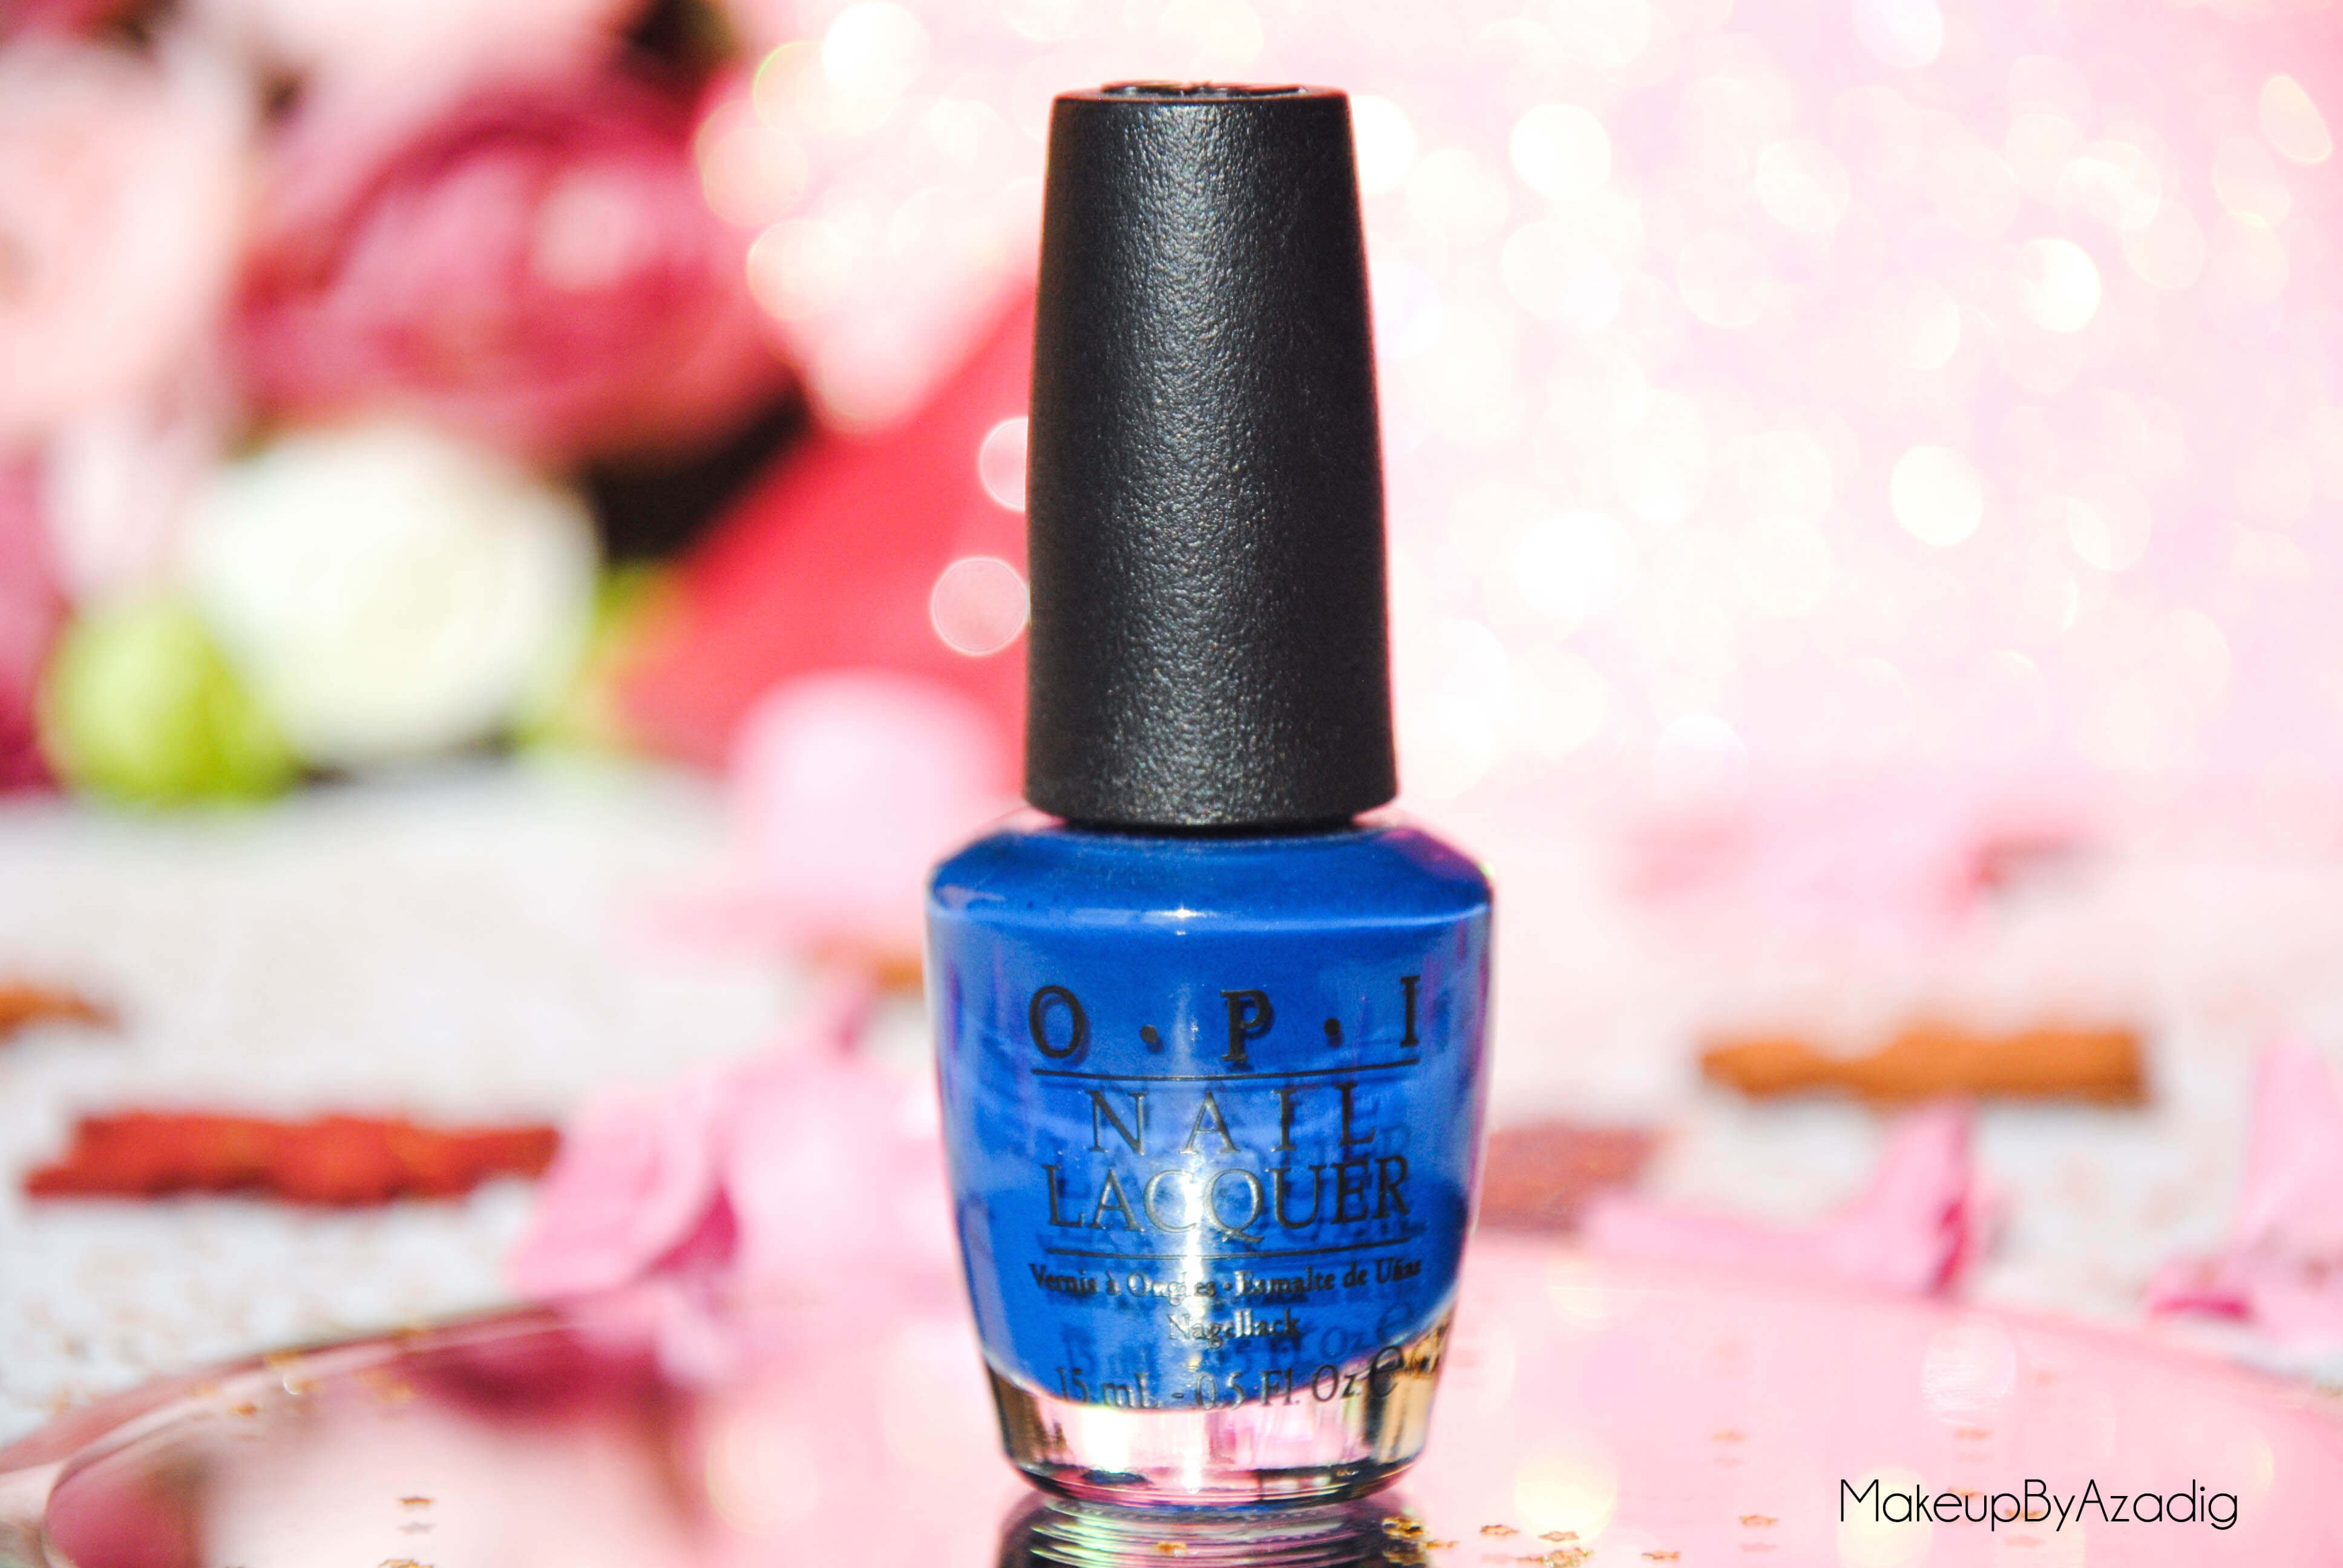 makeupbyazadig-vernis-tendance-automne-nails-autumn-formula-x-monop-makeup-troyes-dijon-paris-sandrea26france-camaieu-opi-kiko-sephora-mavala-essie-blue